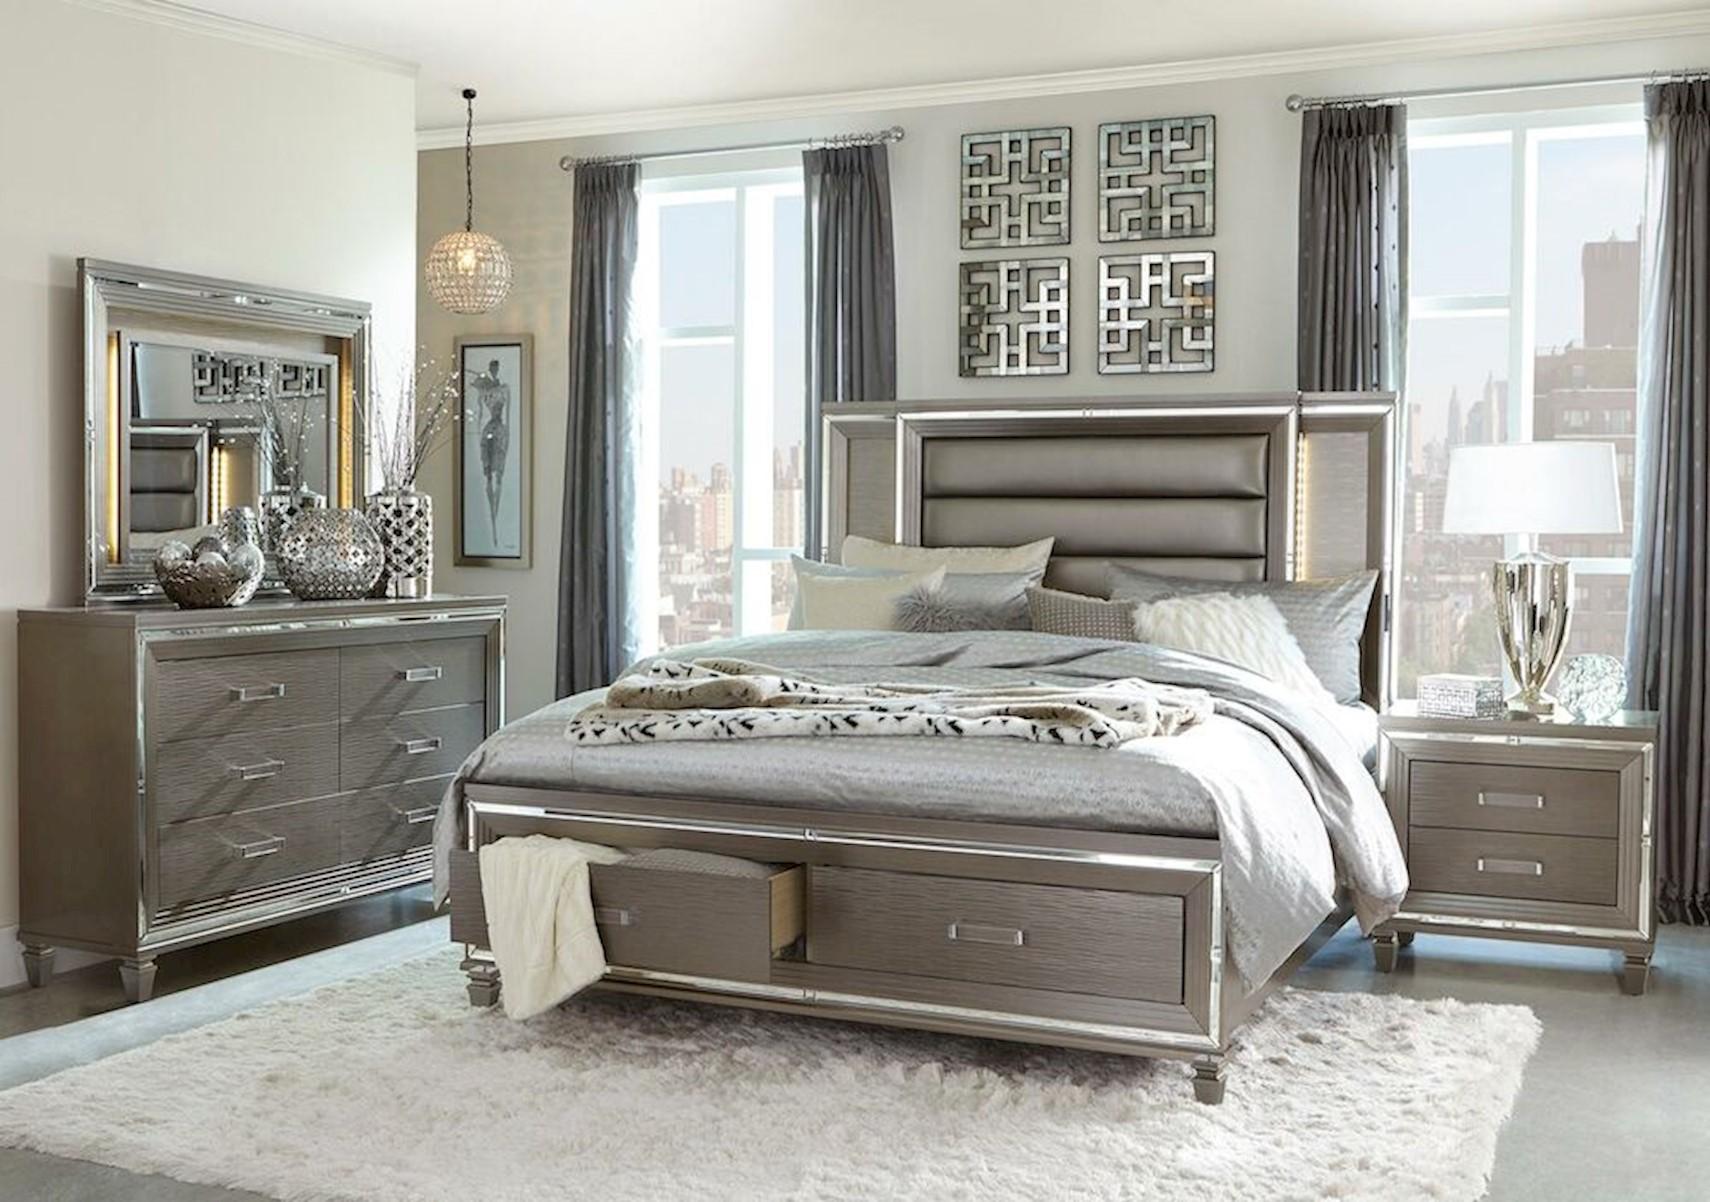 Lacks Athens 4 Pc Queen Bedroom Set